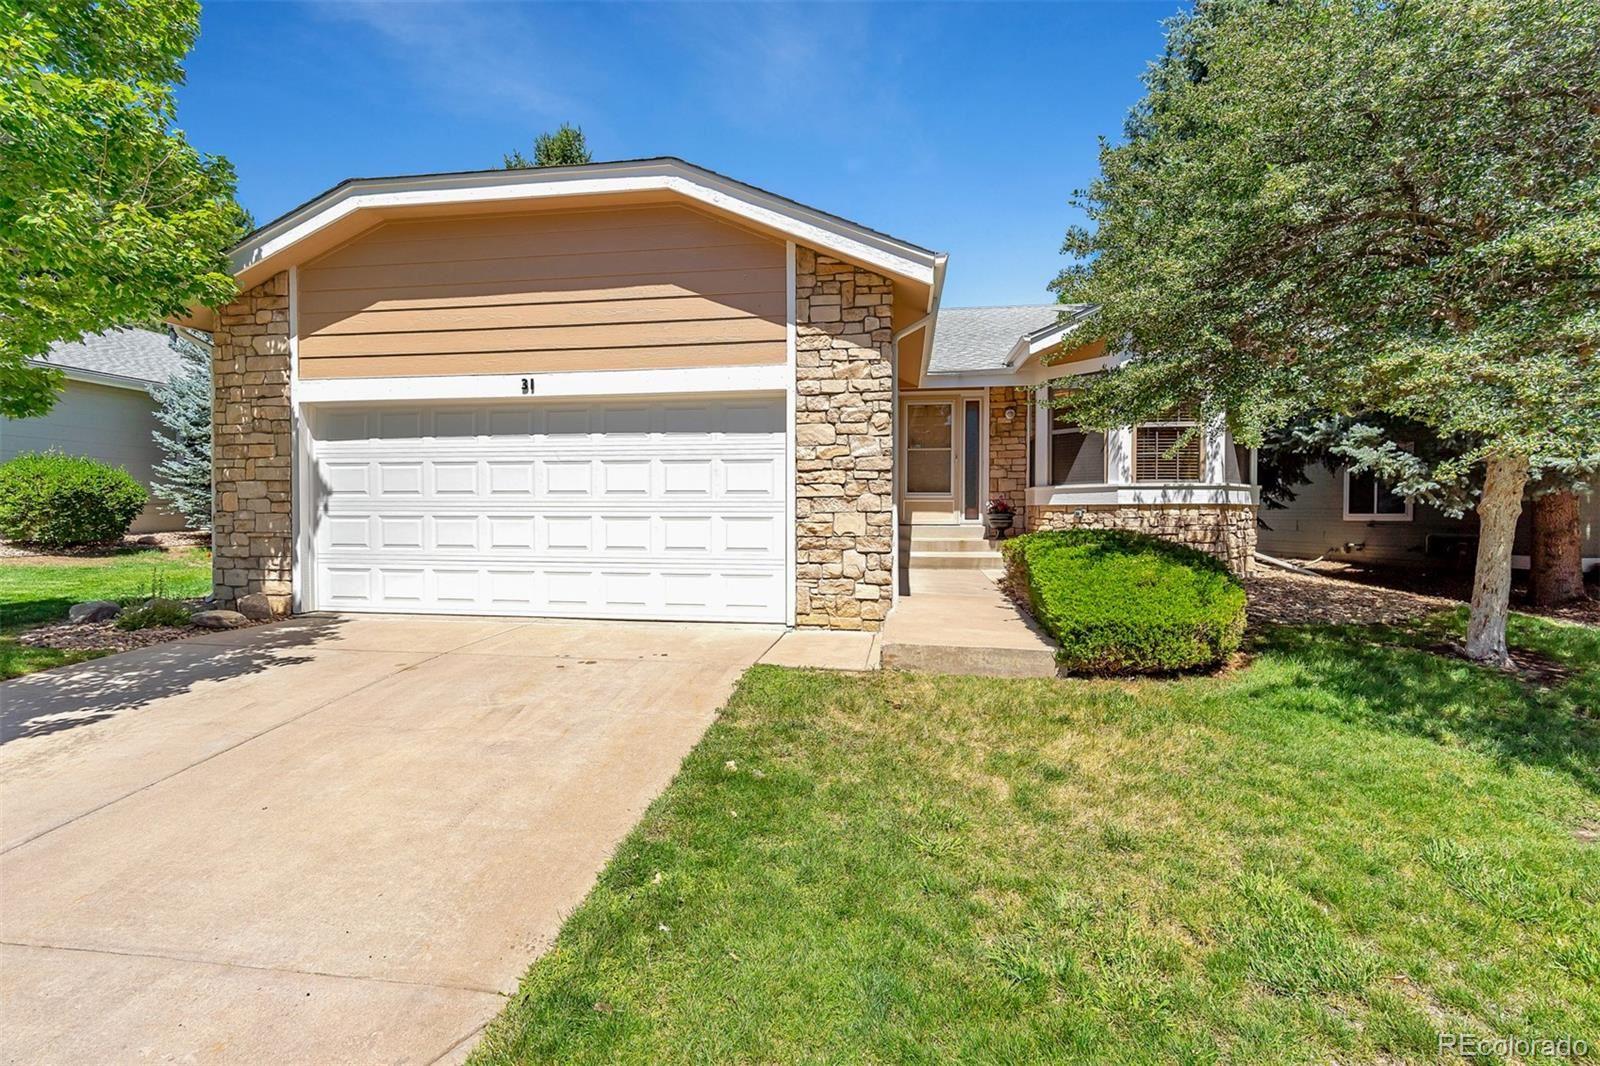 31 Canongate Lane, Highlands Ranch, CO 80130 - #: 4011483